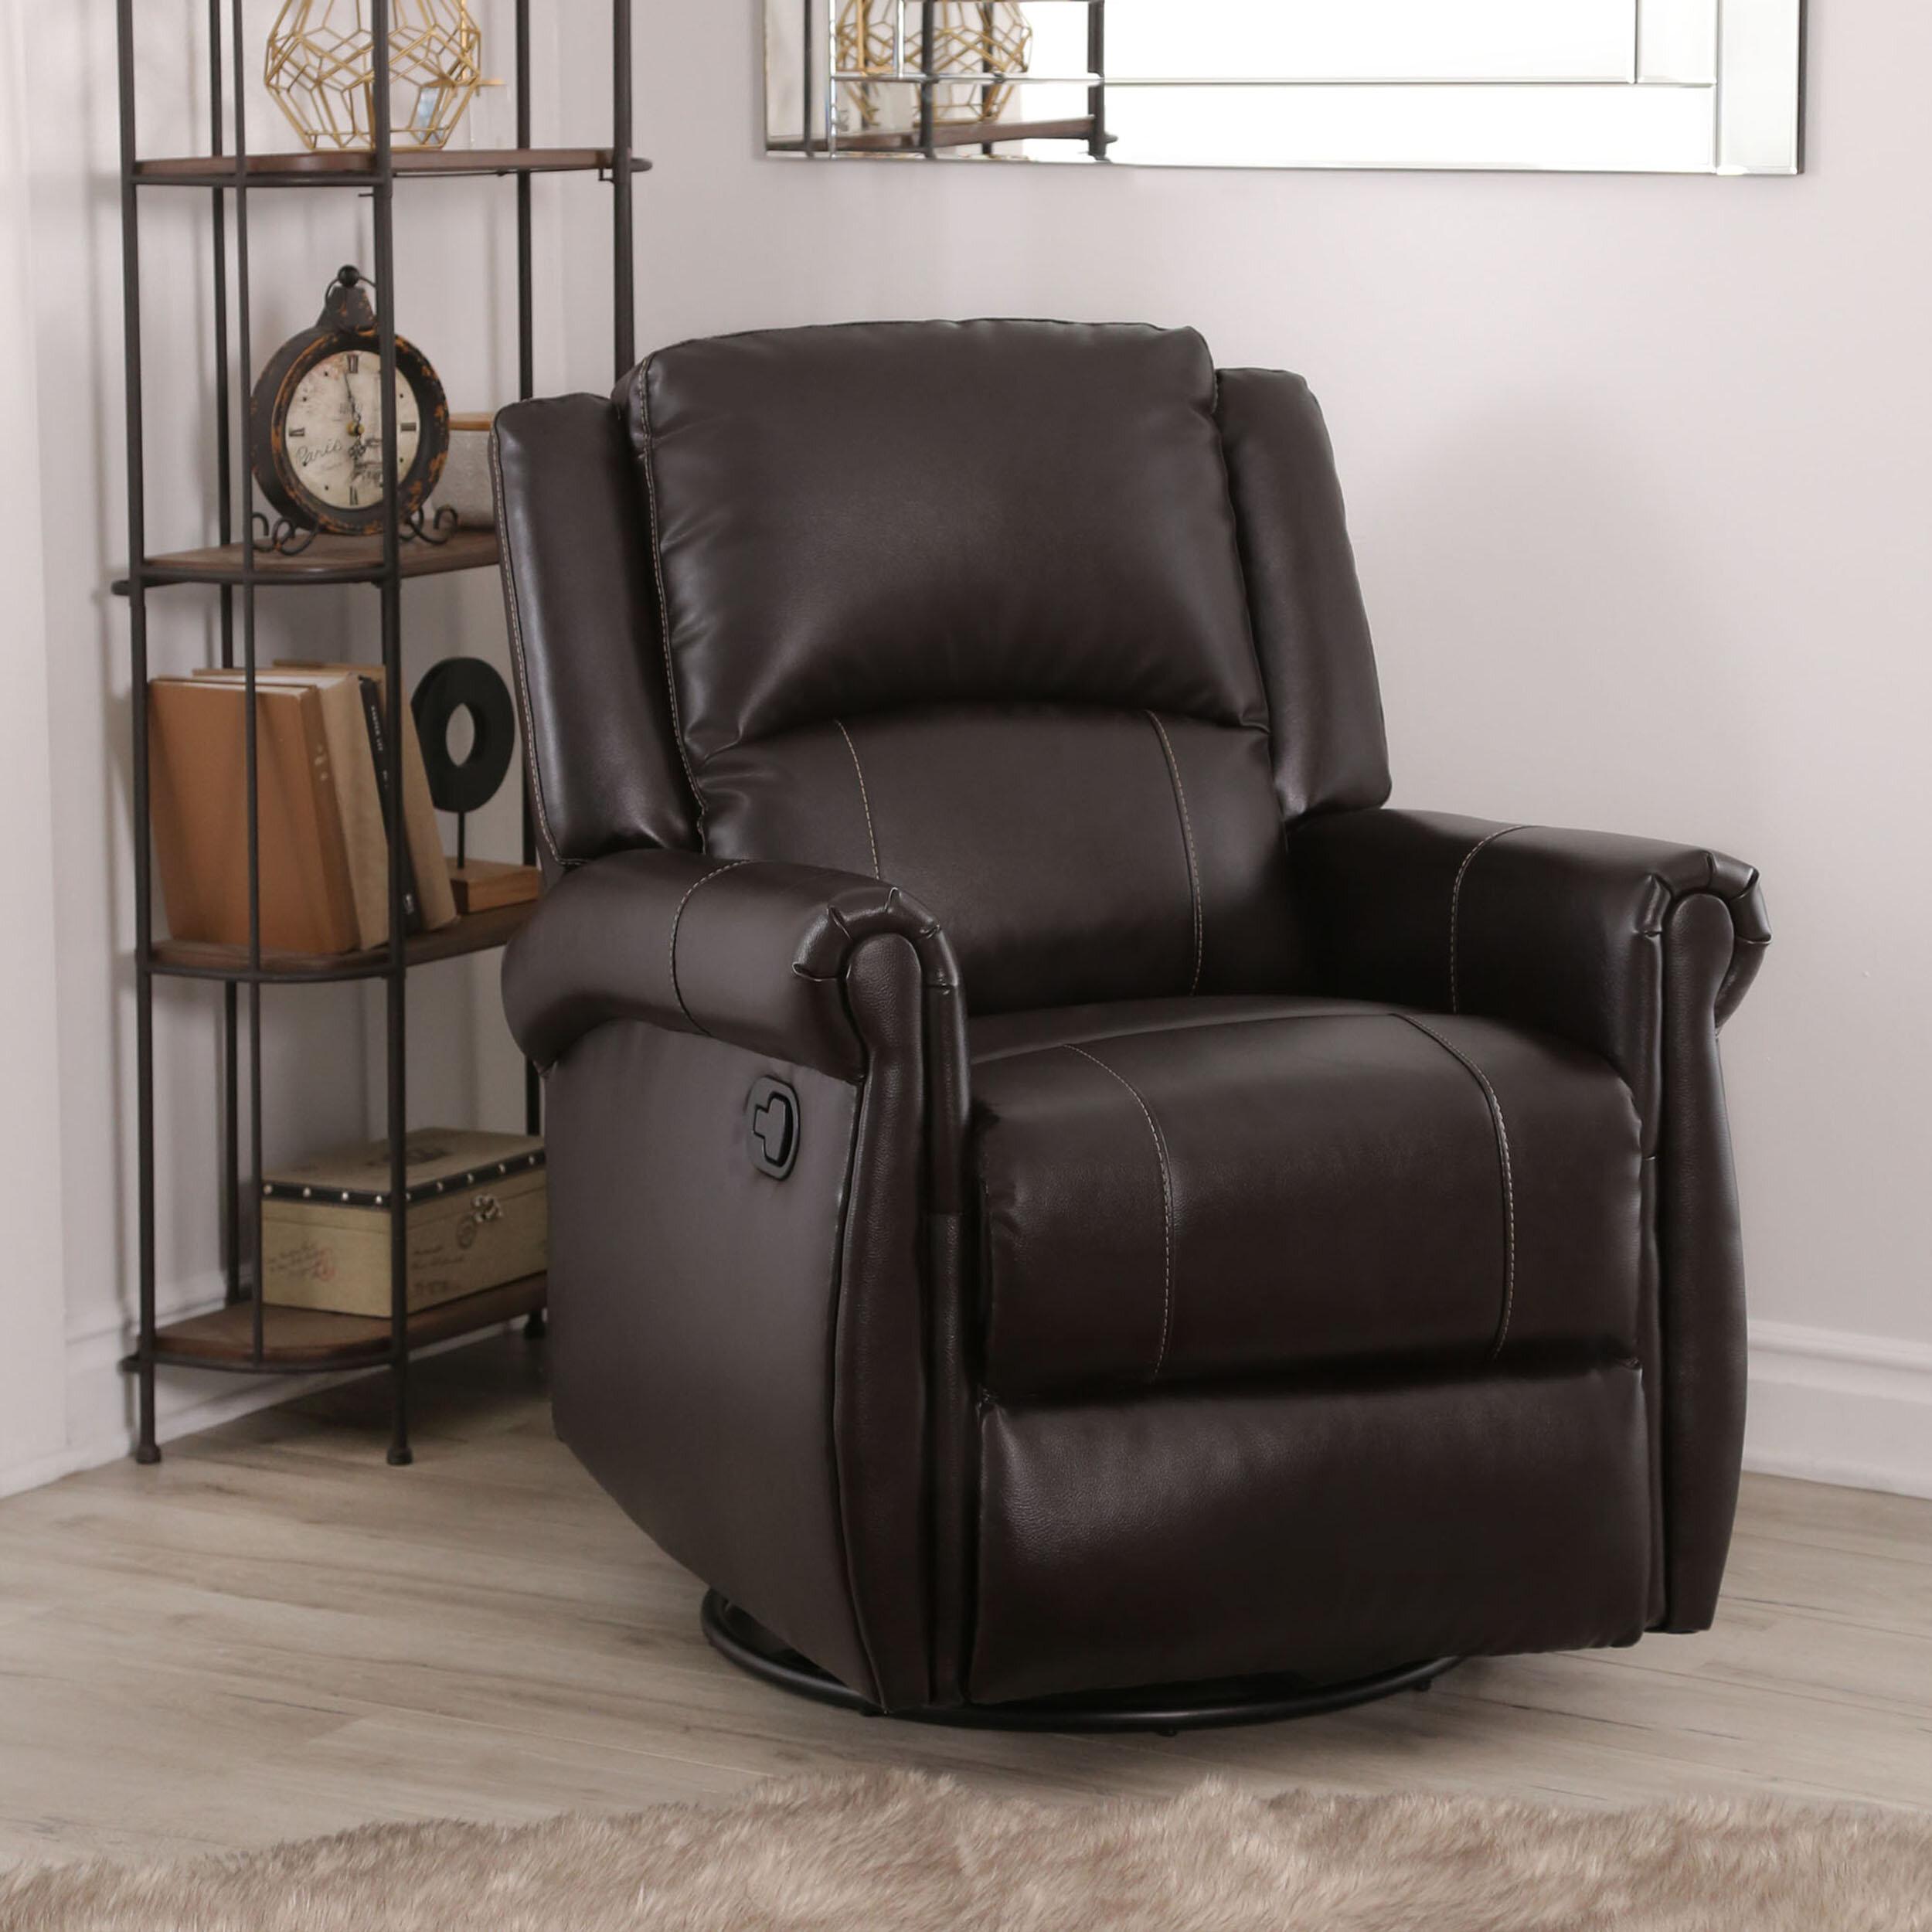 Fabulous Darby Reclining Glider Spiritservingveterans Wood Chair Design Ideas Spiritservingveteransorg